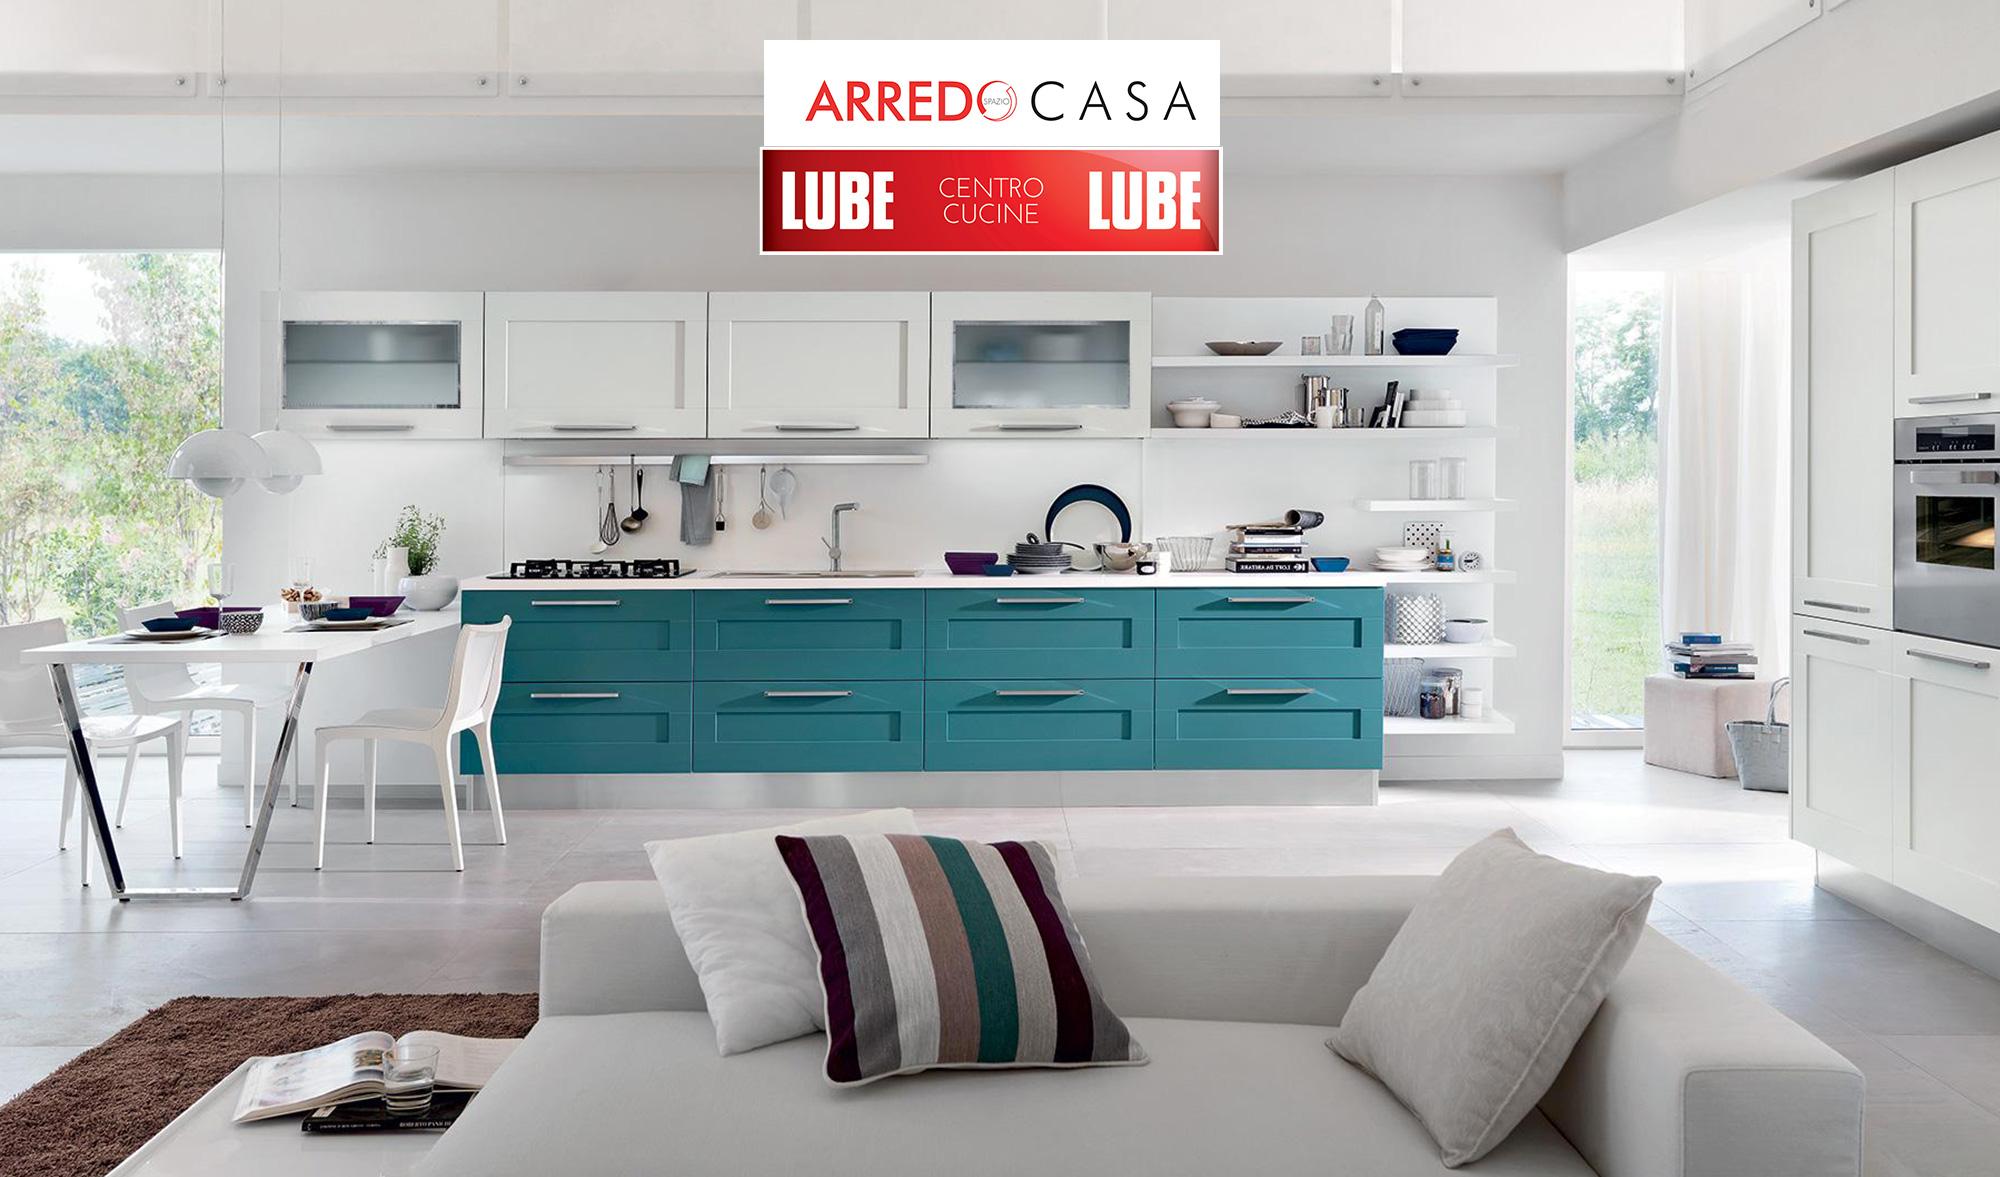 Beautiful comprare una cucina pictures home interior ideas - Quale cucina comprare ...